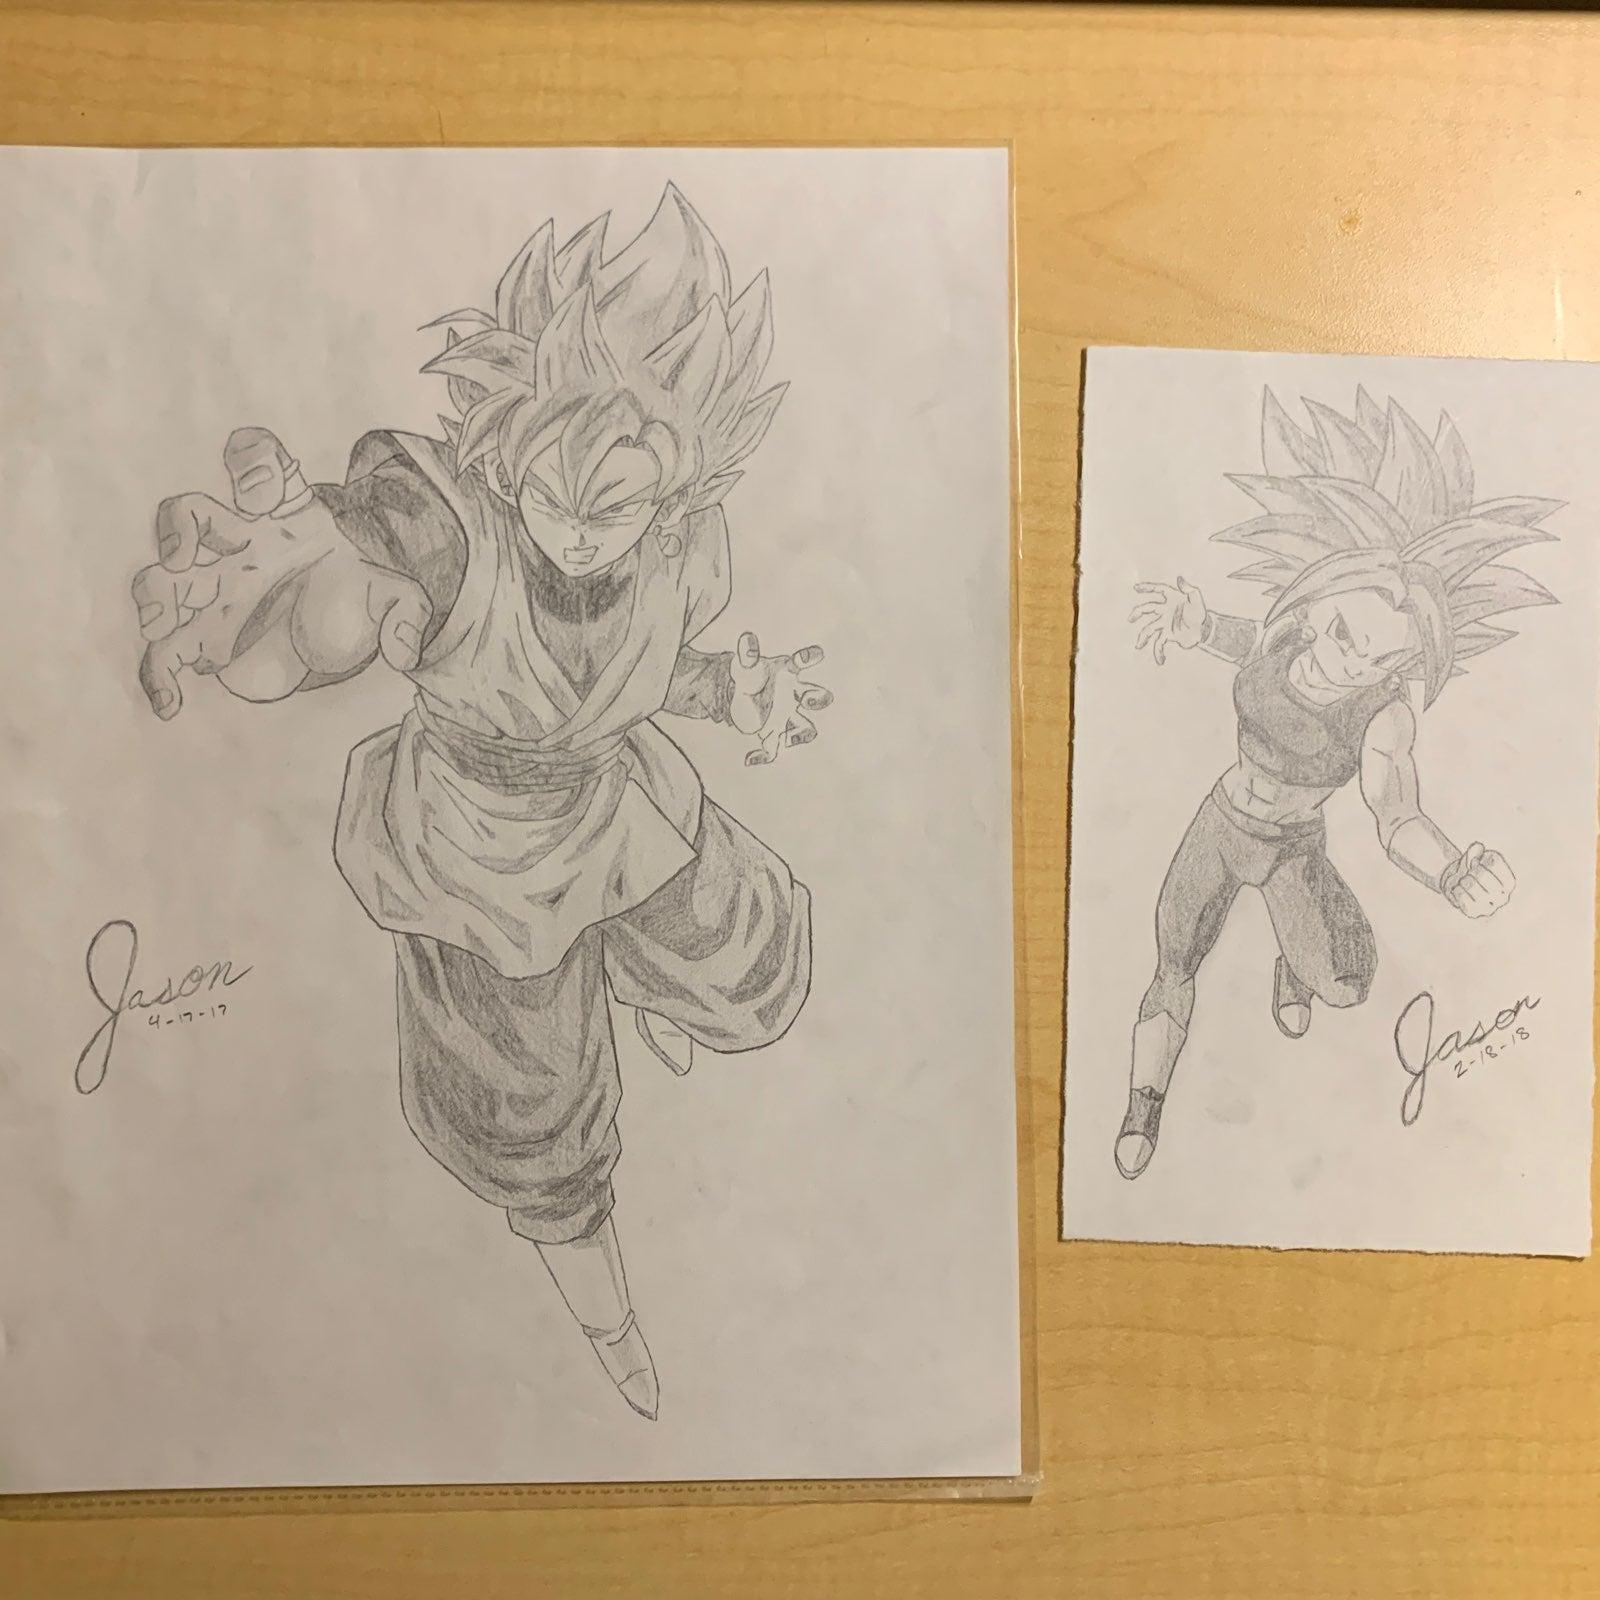 Dragon Ball Super Drawings